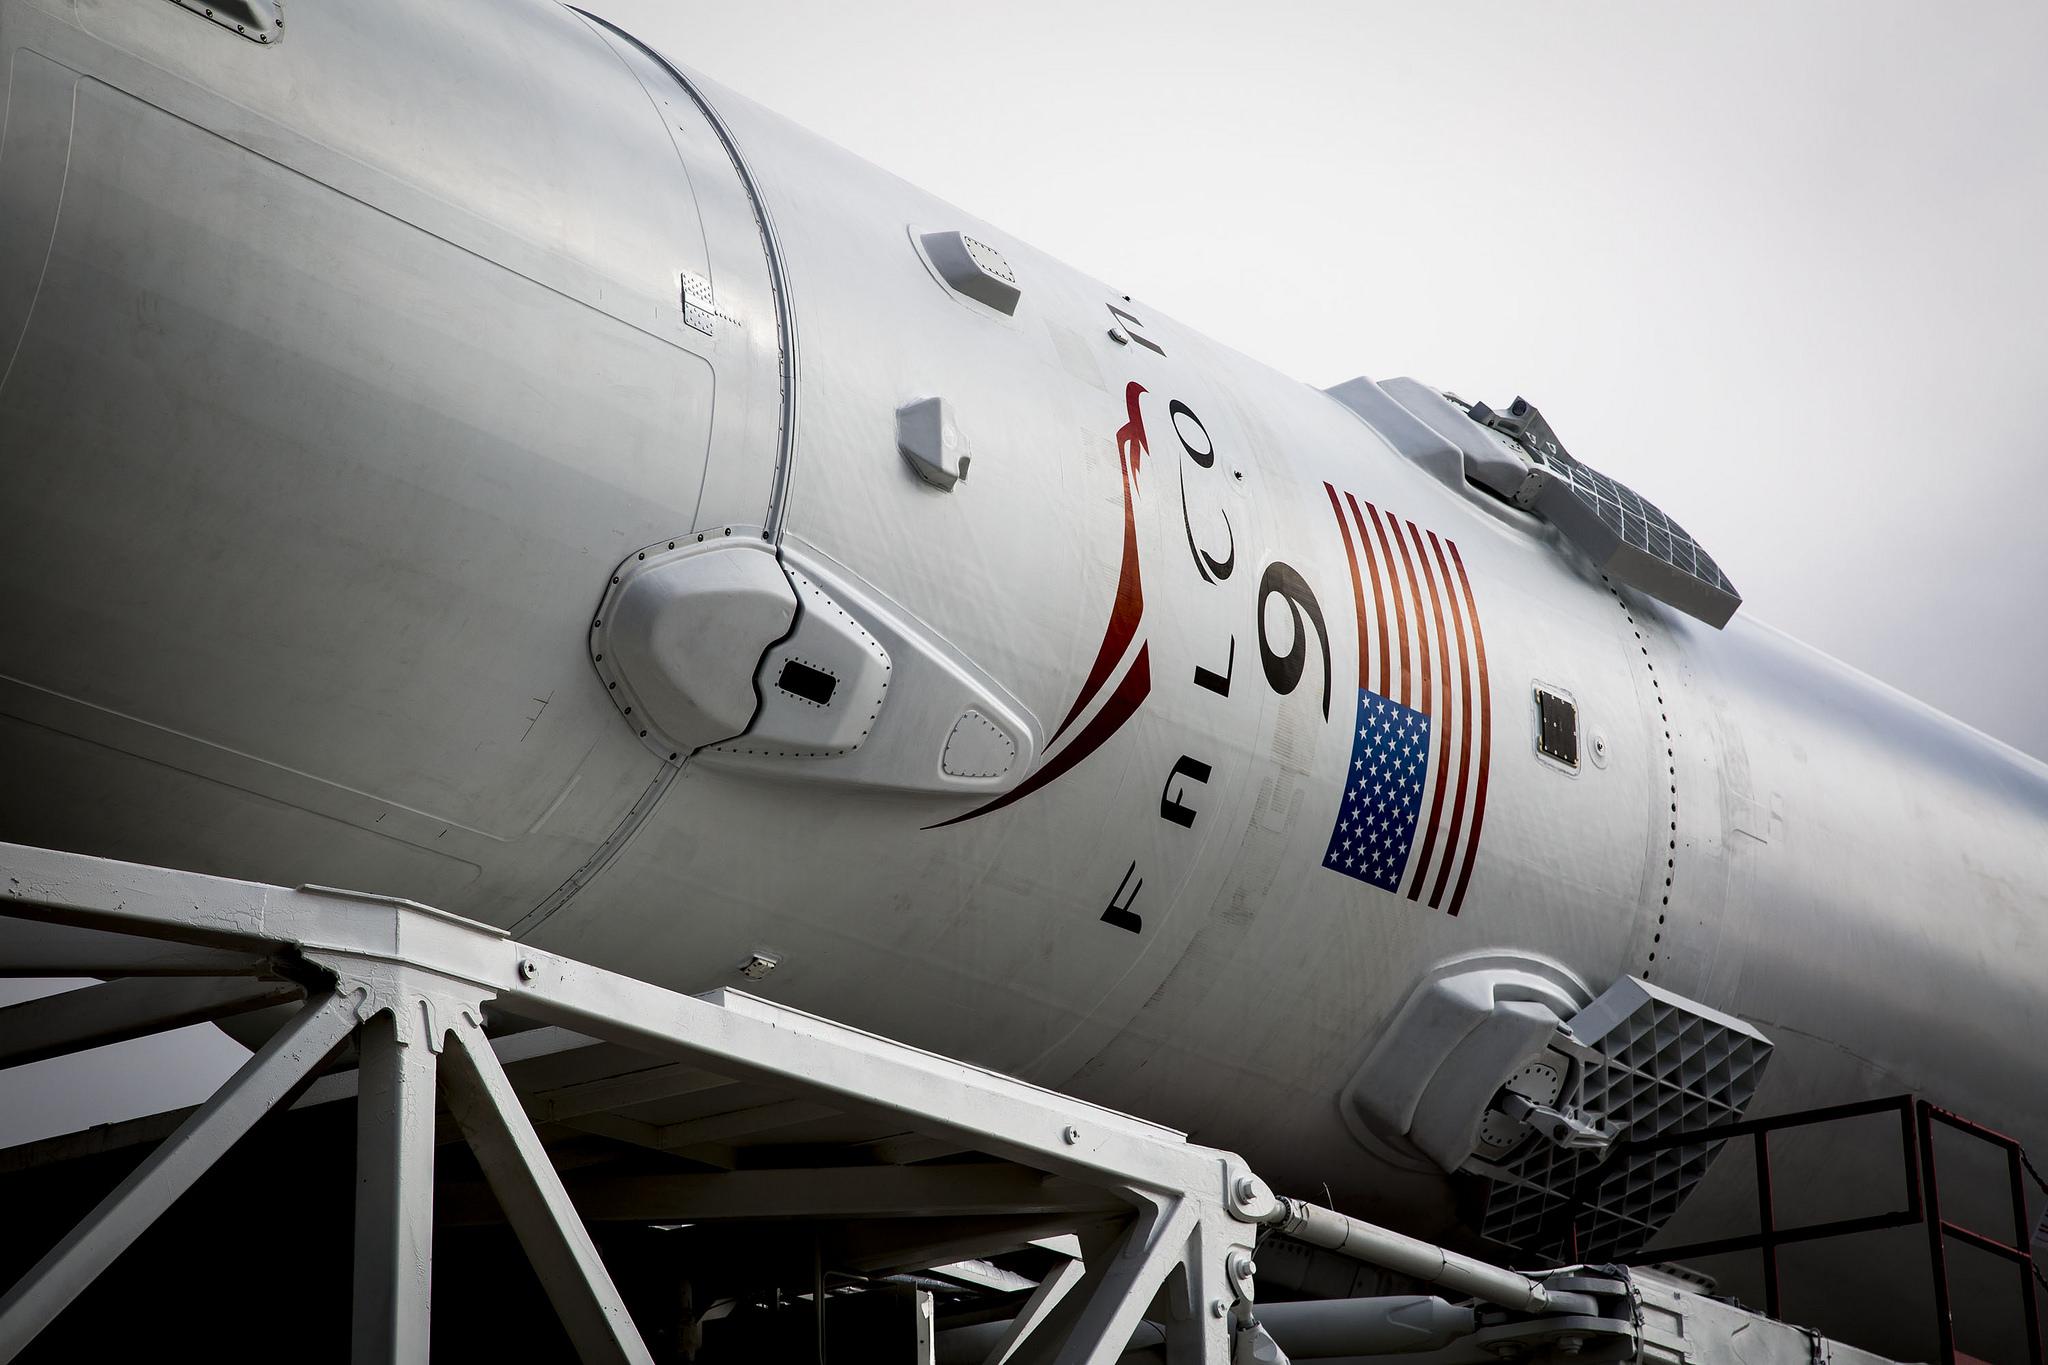 Falcon 9 Rocket Closeup for Jason-3